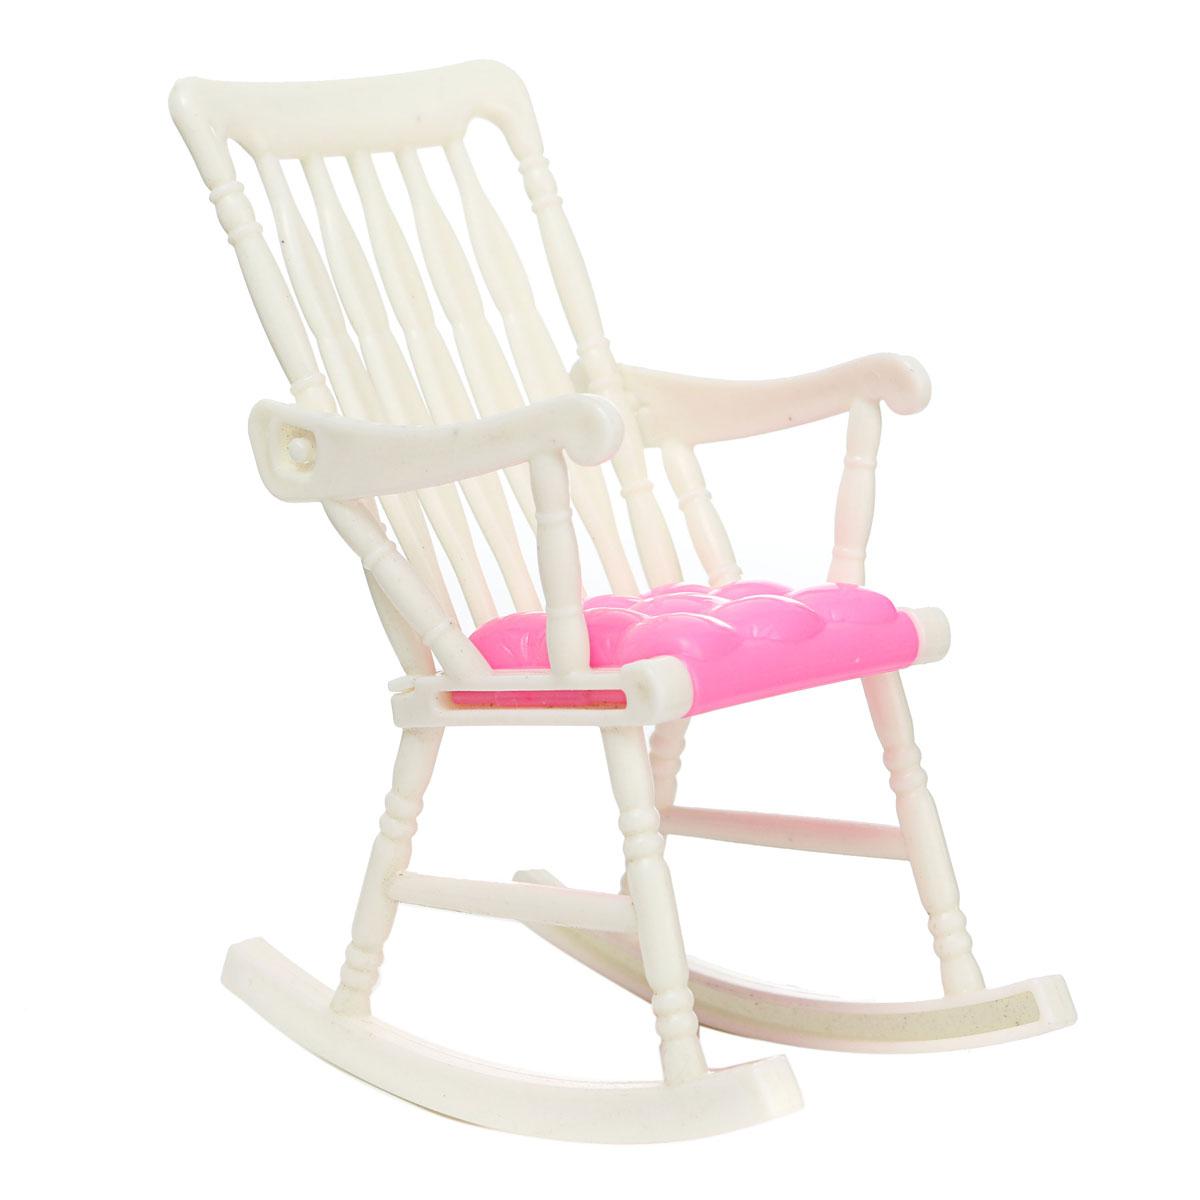 chair accessories manufacturers restoration hardware desk review popular dolls rocking buy cheap